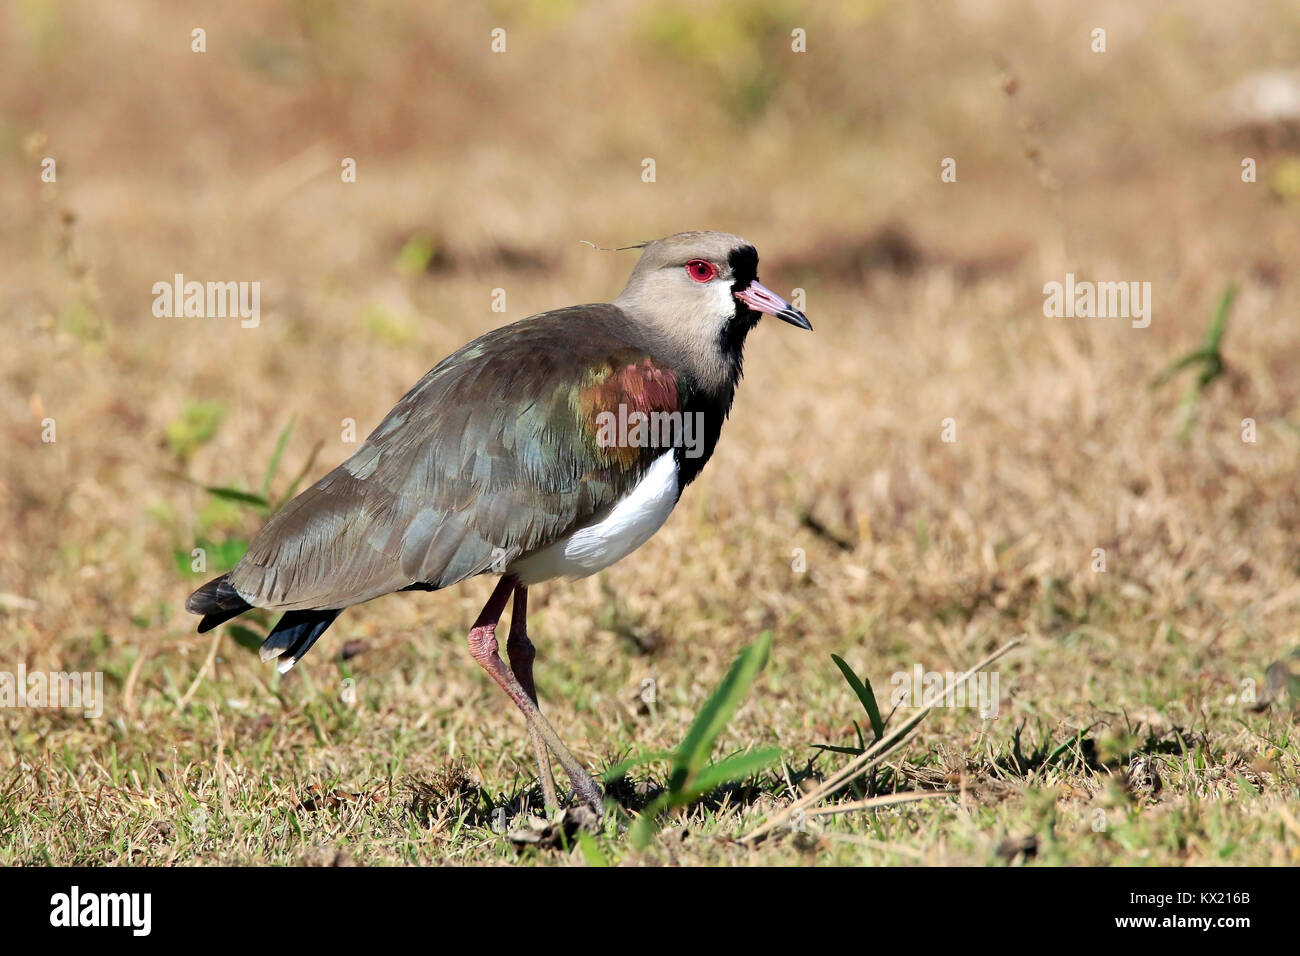 Southern Lapwing in Rio Claro. Pantanal, Brazil - Stock Image